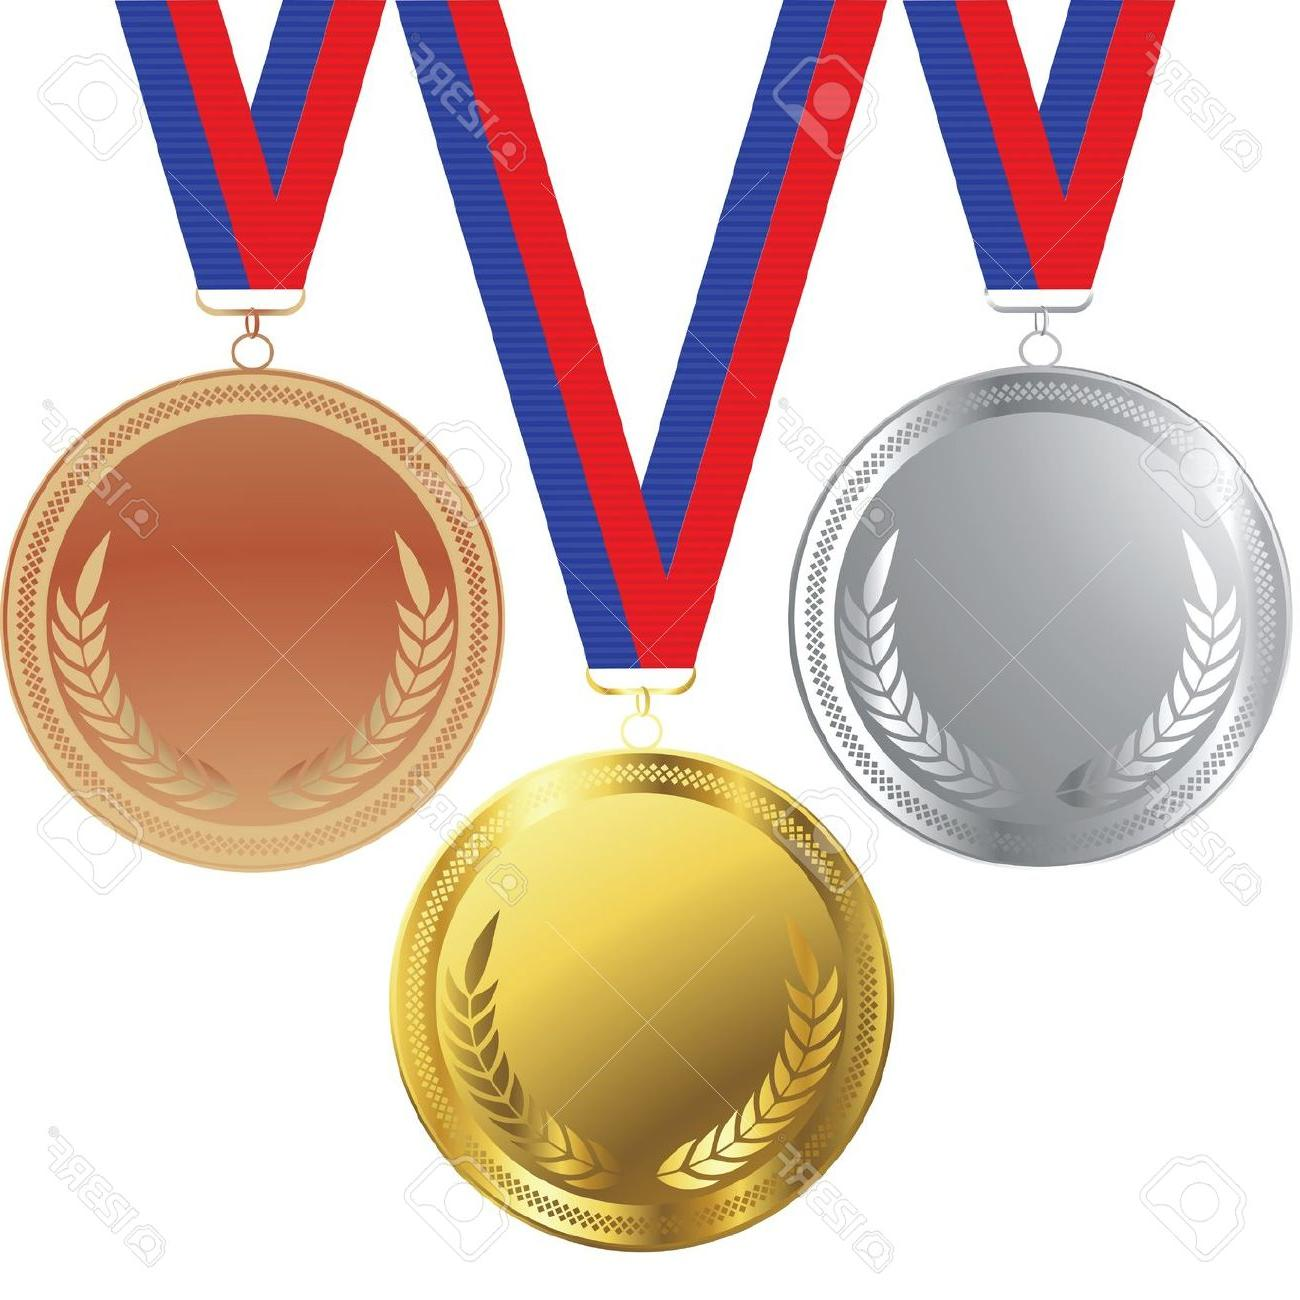 medal clipart 2-medal clipart 2-8